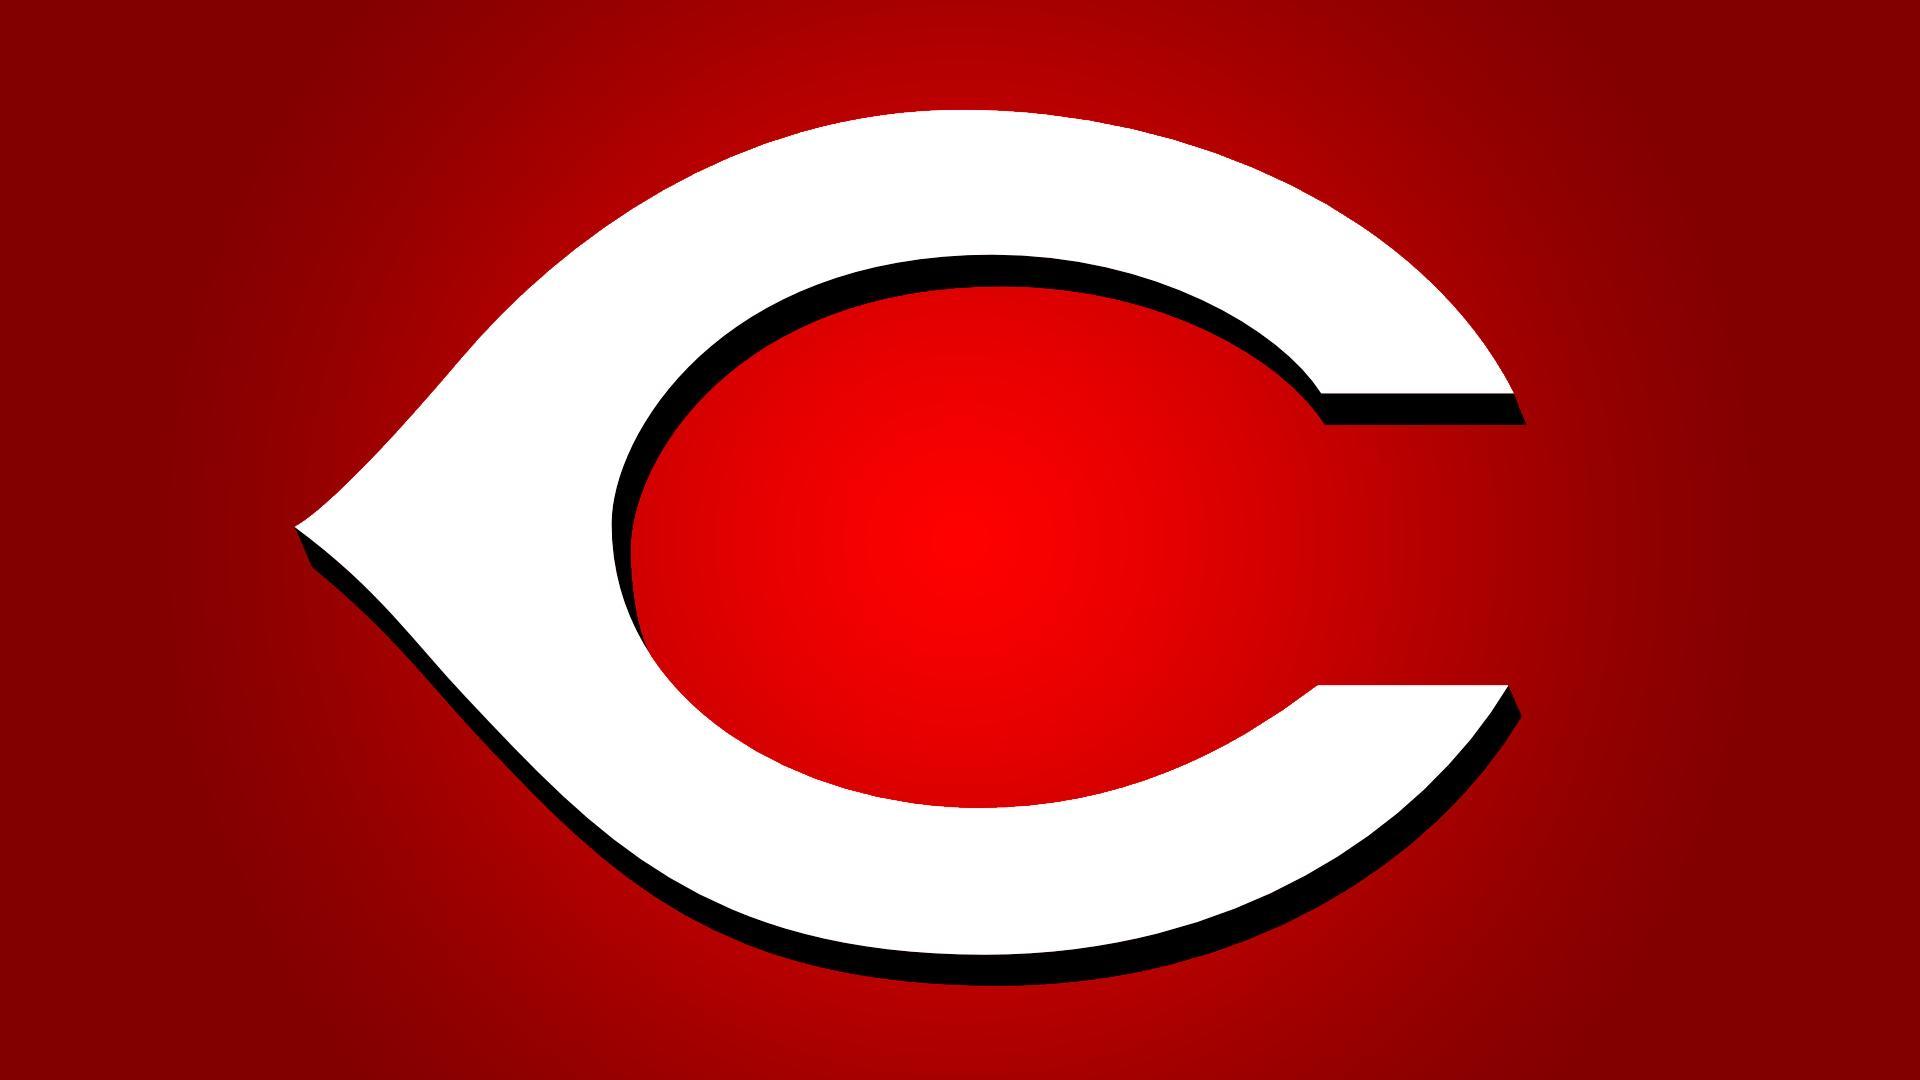 CINCINNATI REDS mlb baseball 1 wallpaper 1920x1080 229493 1920x1080